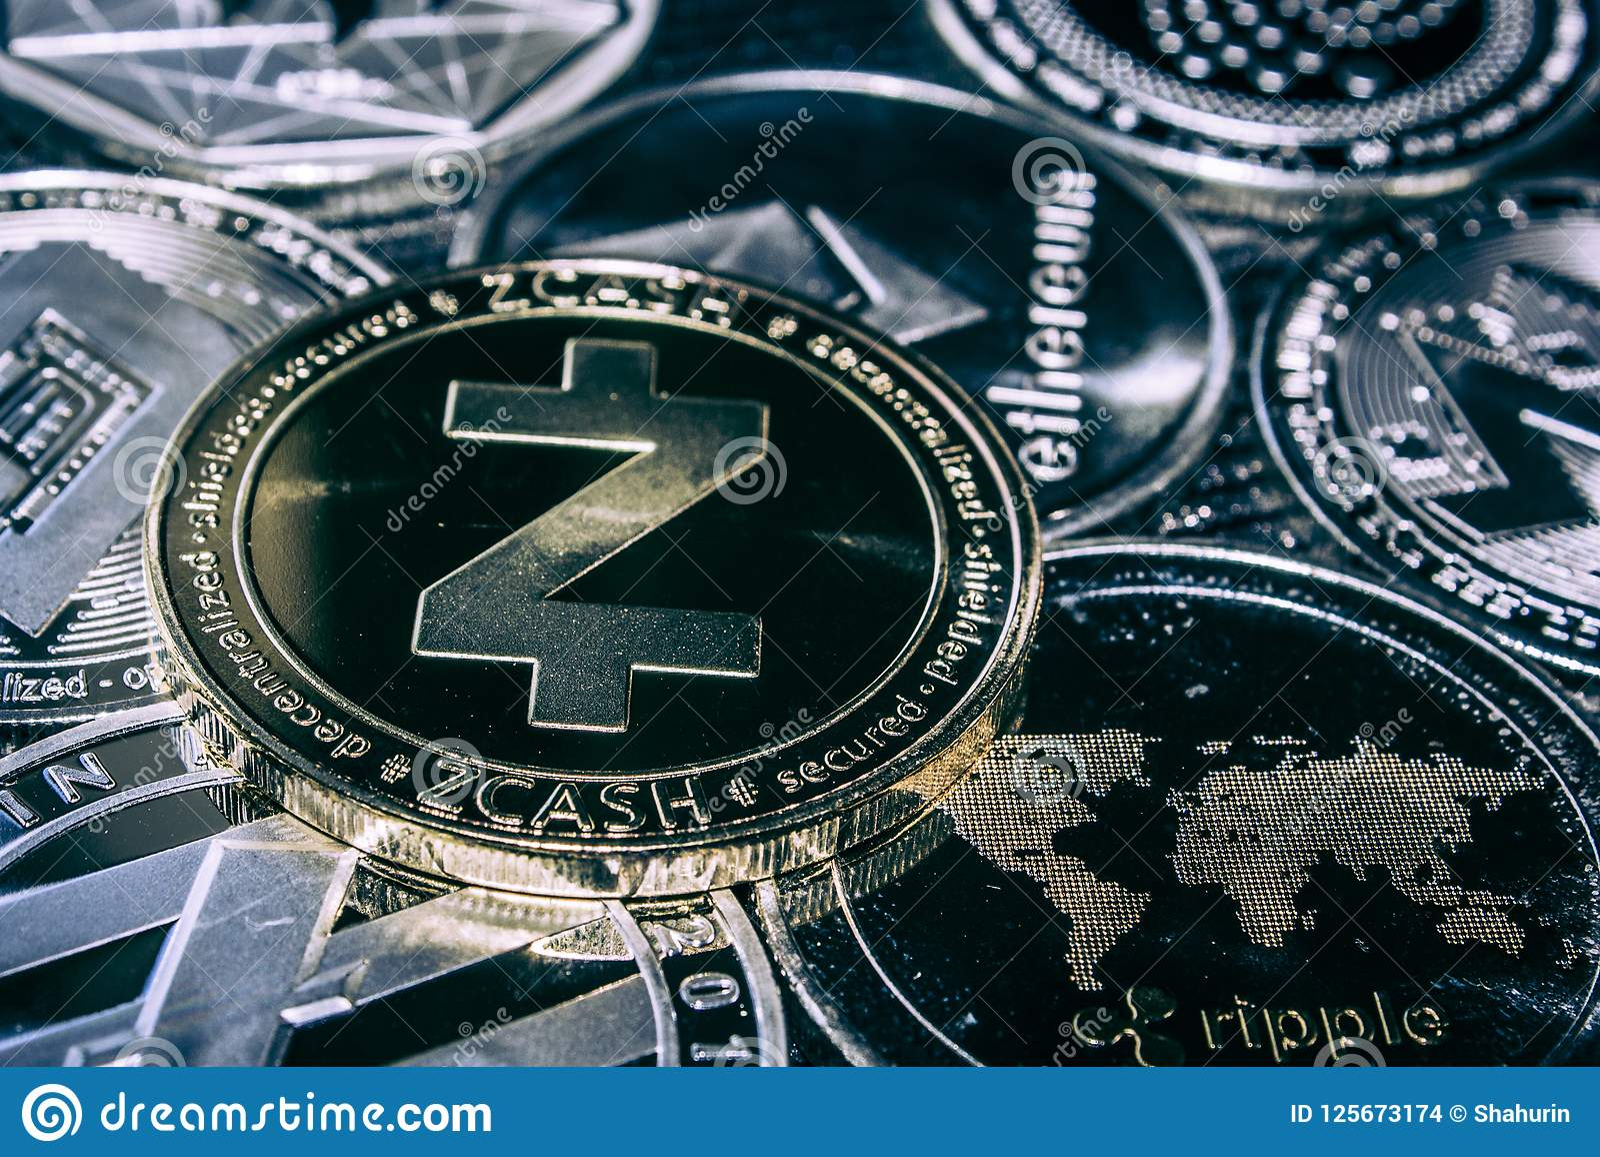 Cryptocurrency Zcash νομισμάτων στο υπόβαθρο των κύριων altcoins